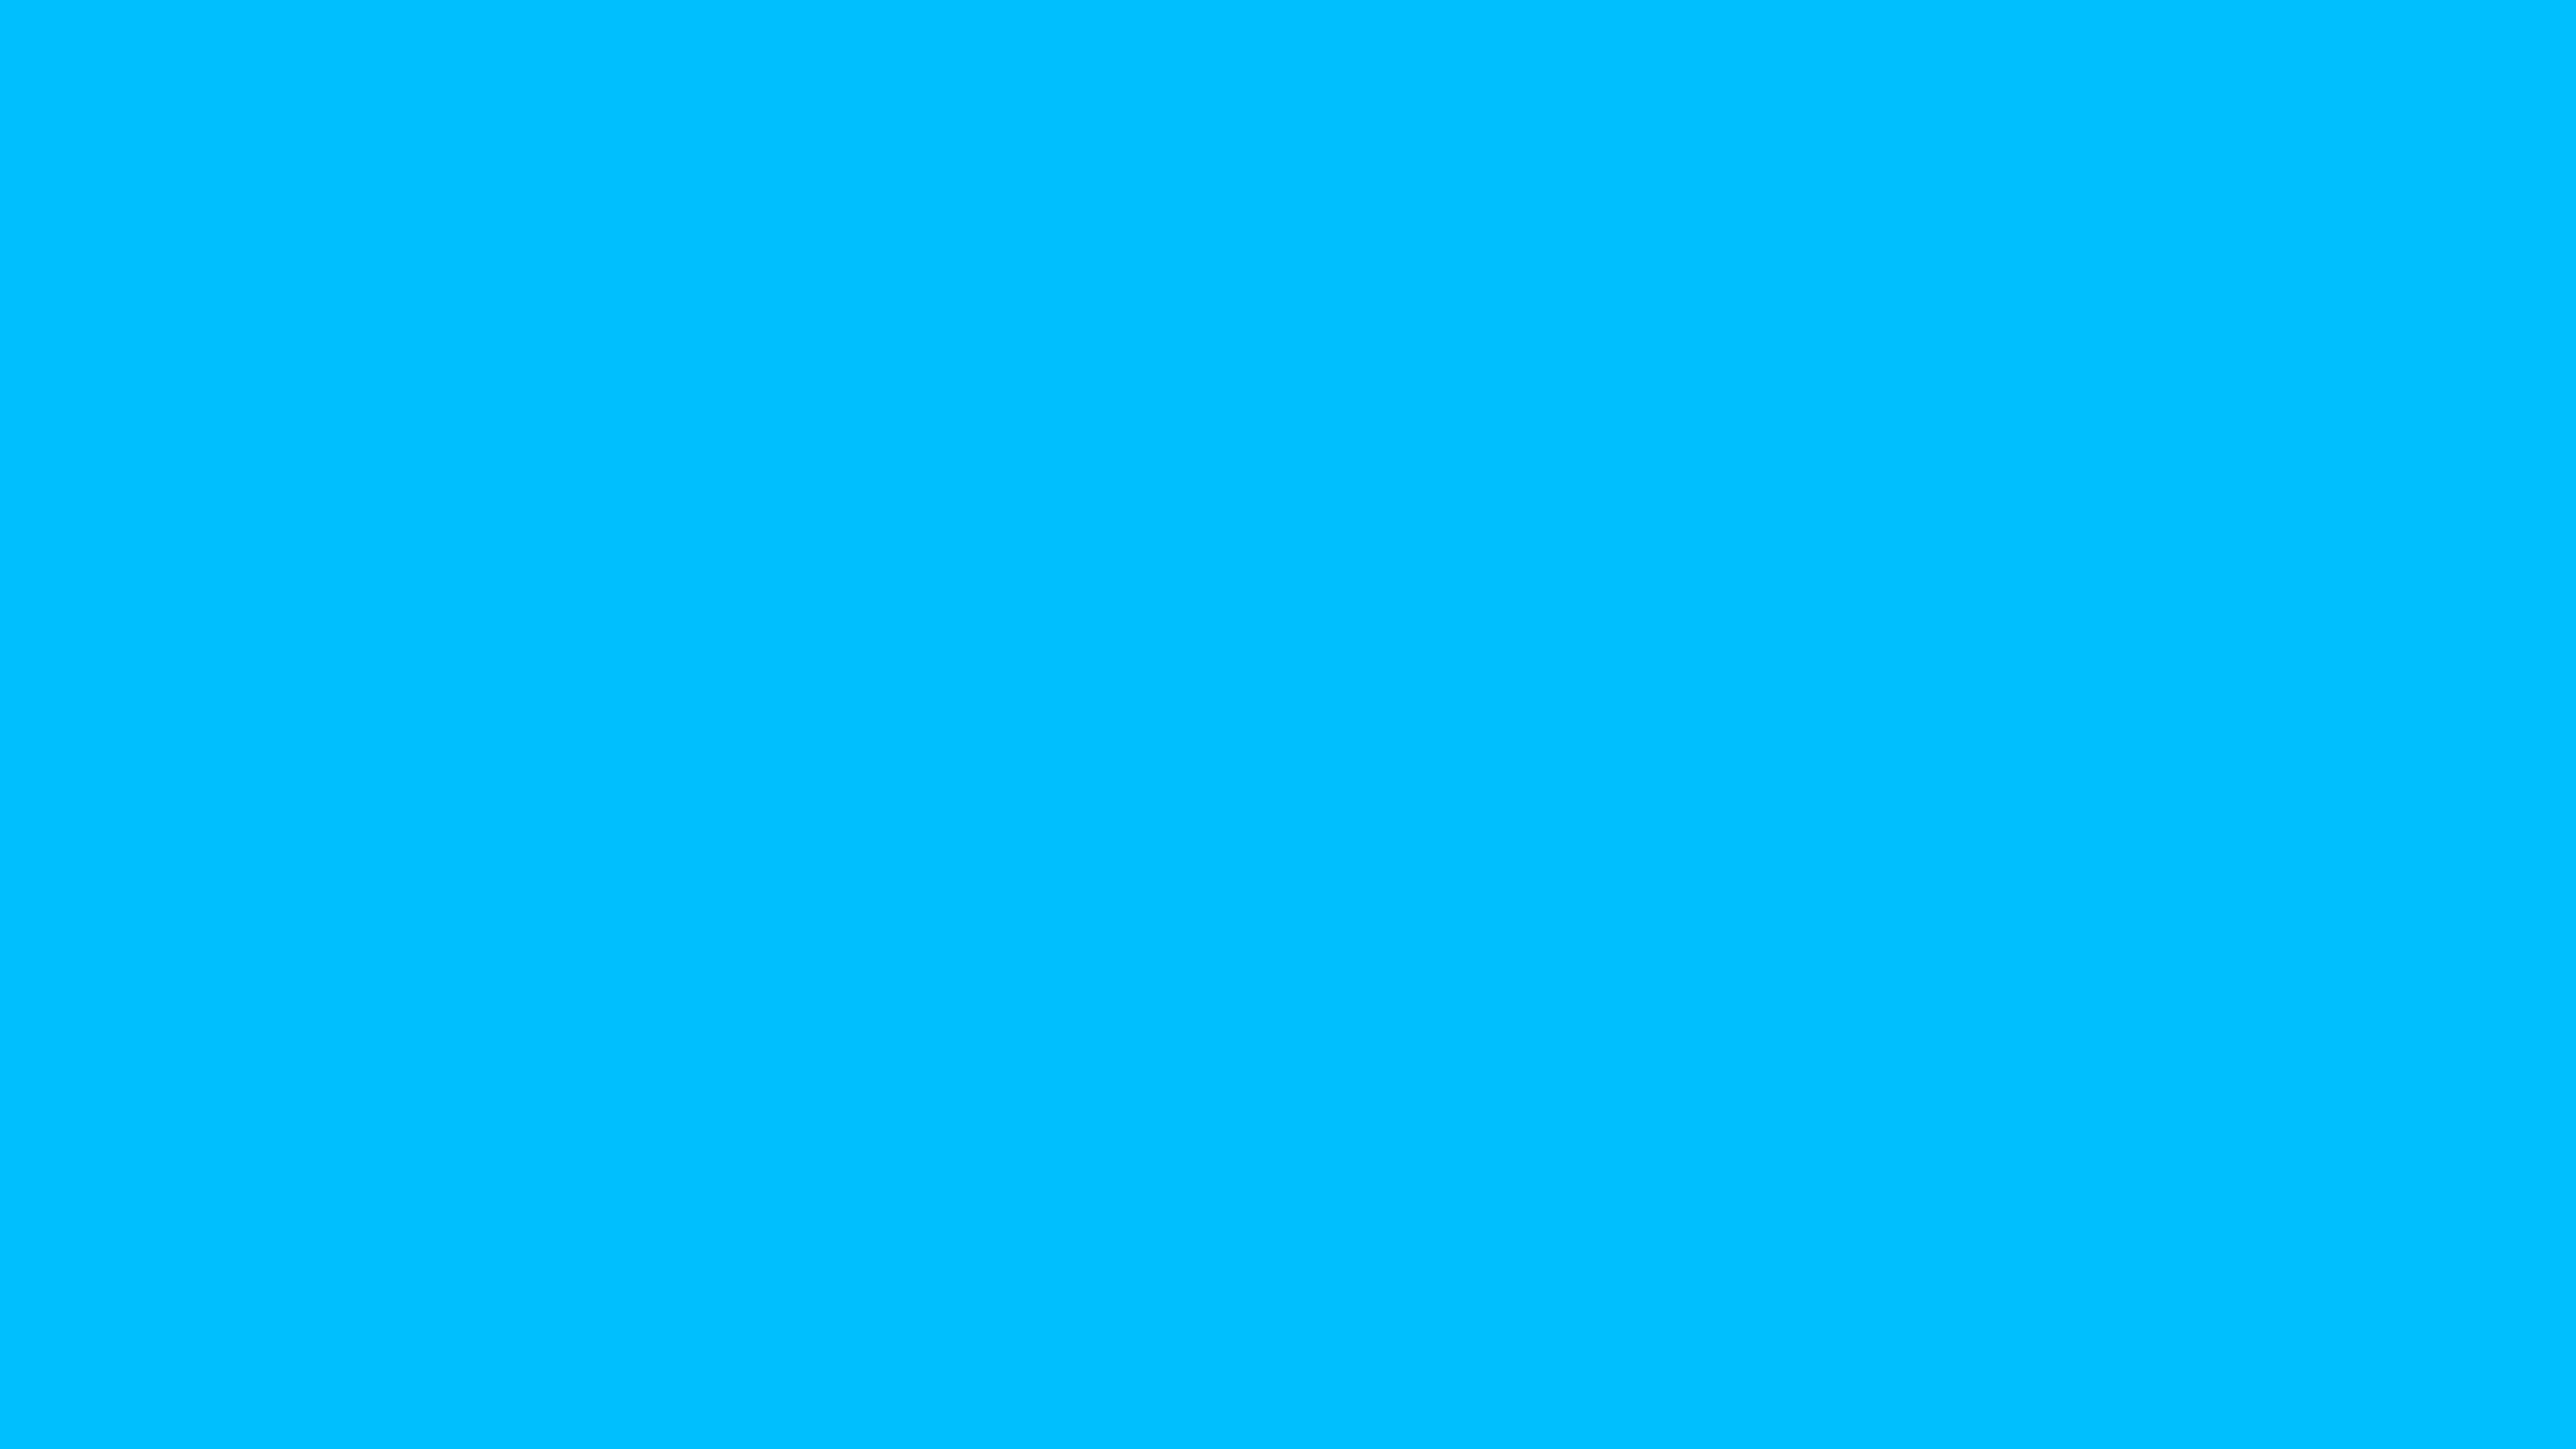 3840x2160 Capri Solid Color Background